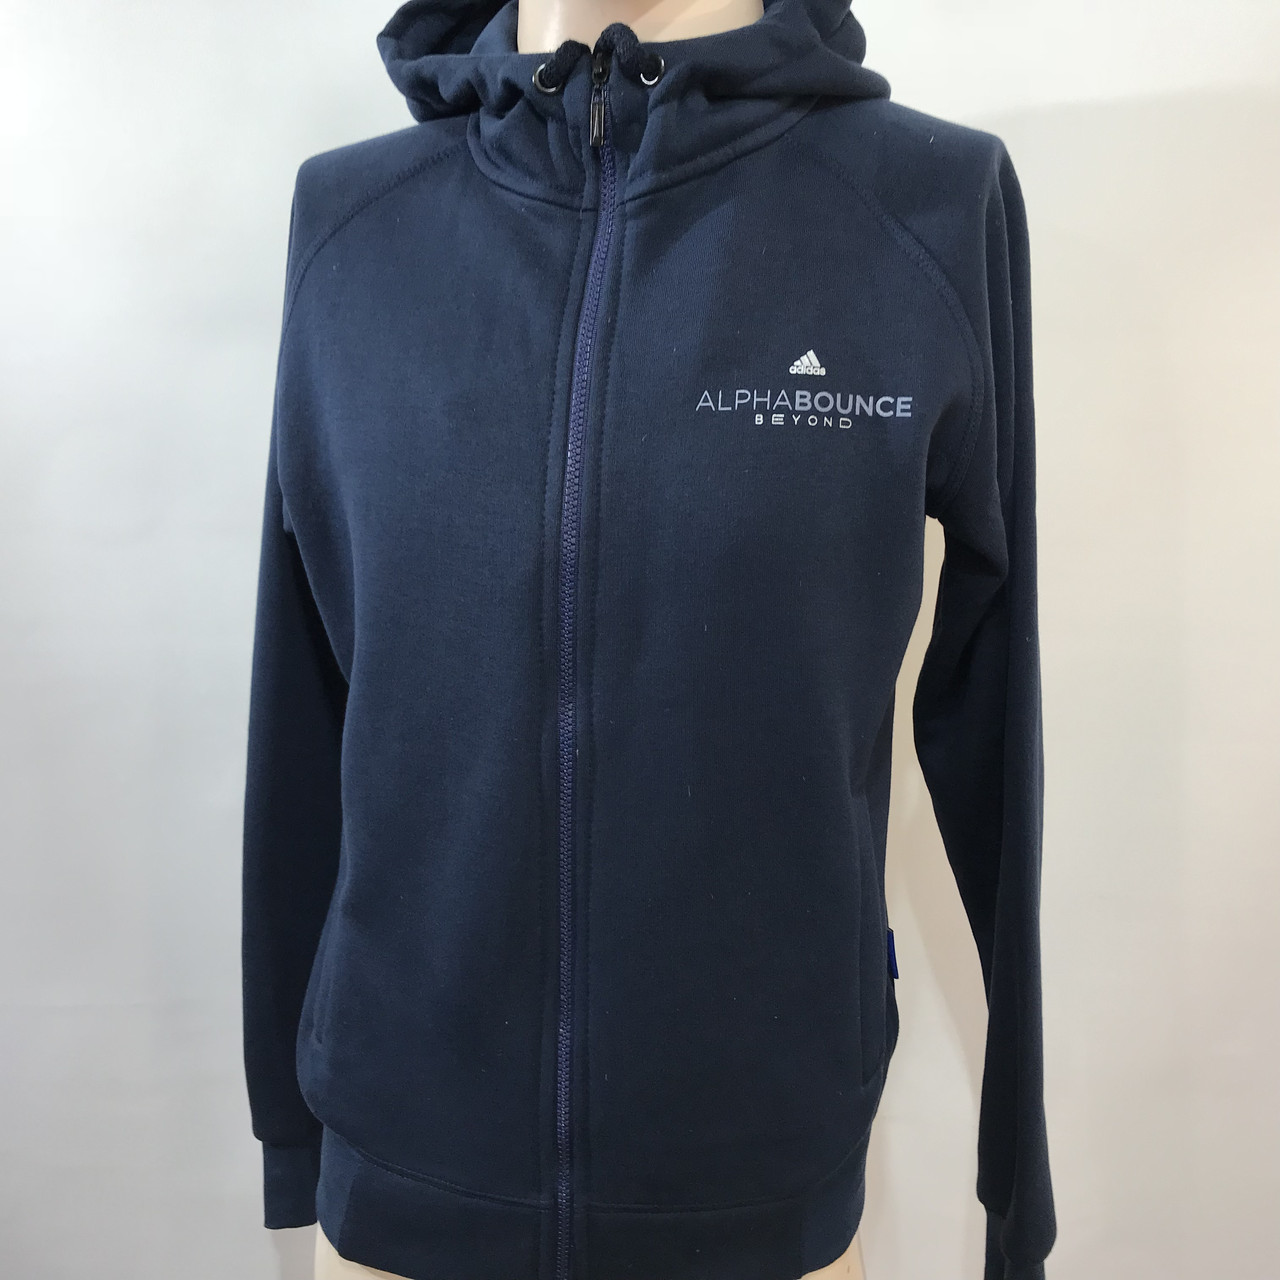 Мужская теплая кофта Adidas/ темно-синяя, фото 1